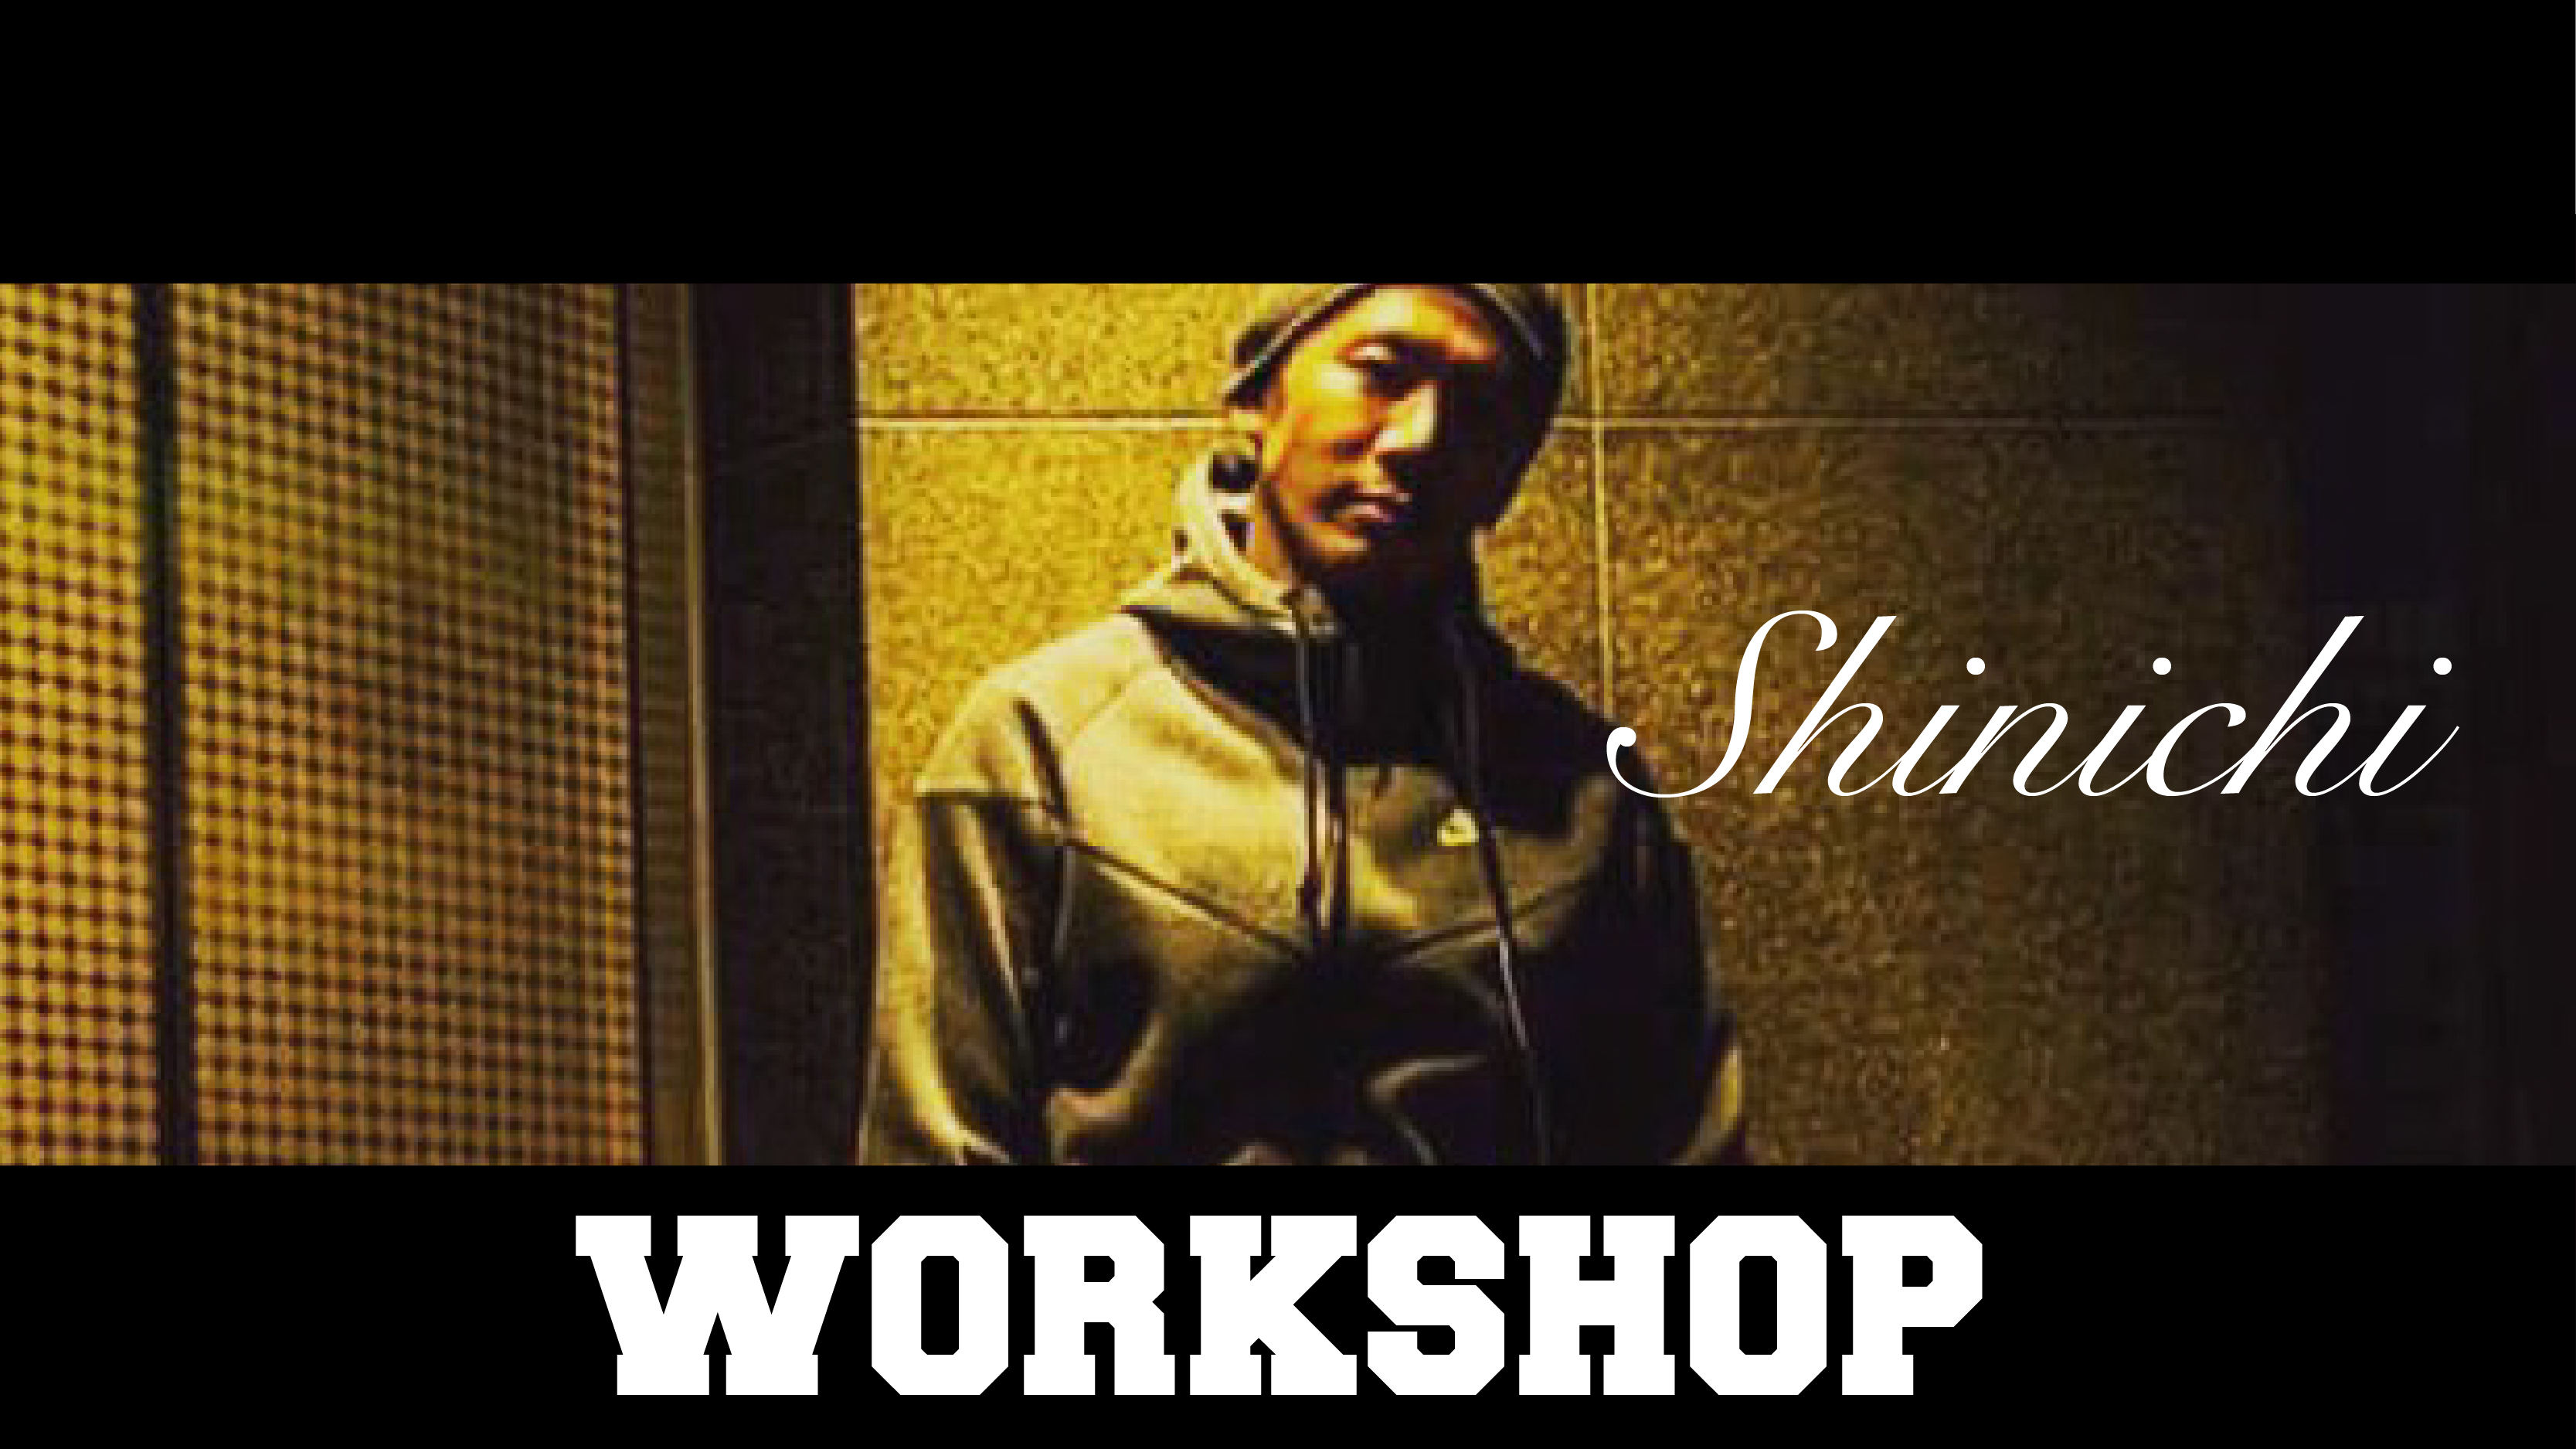 SHINICHI WORKSHOP at Vega